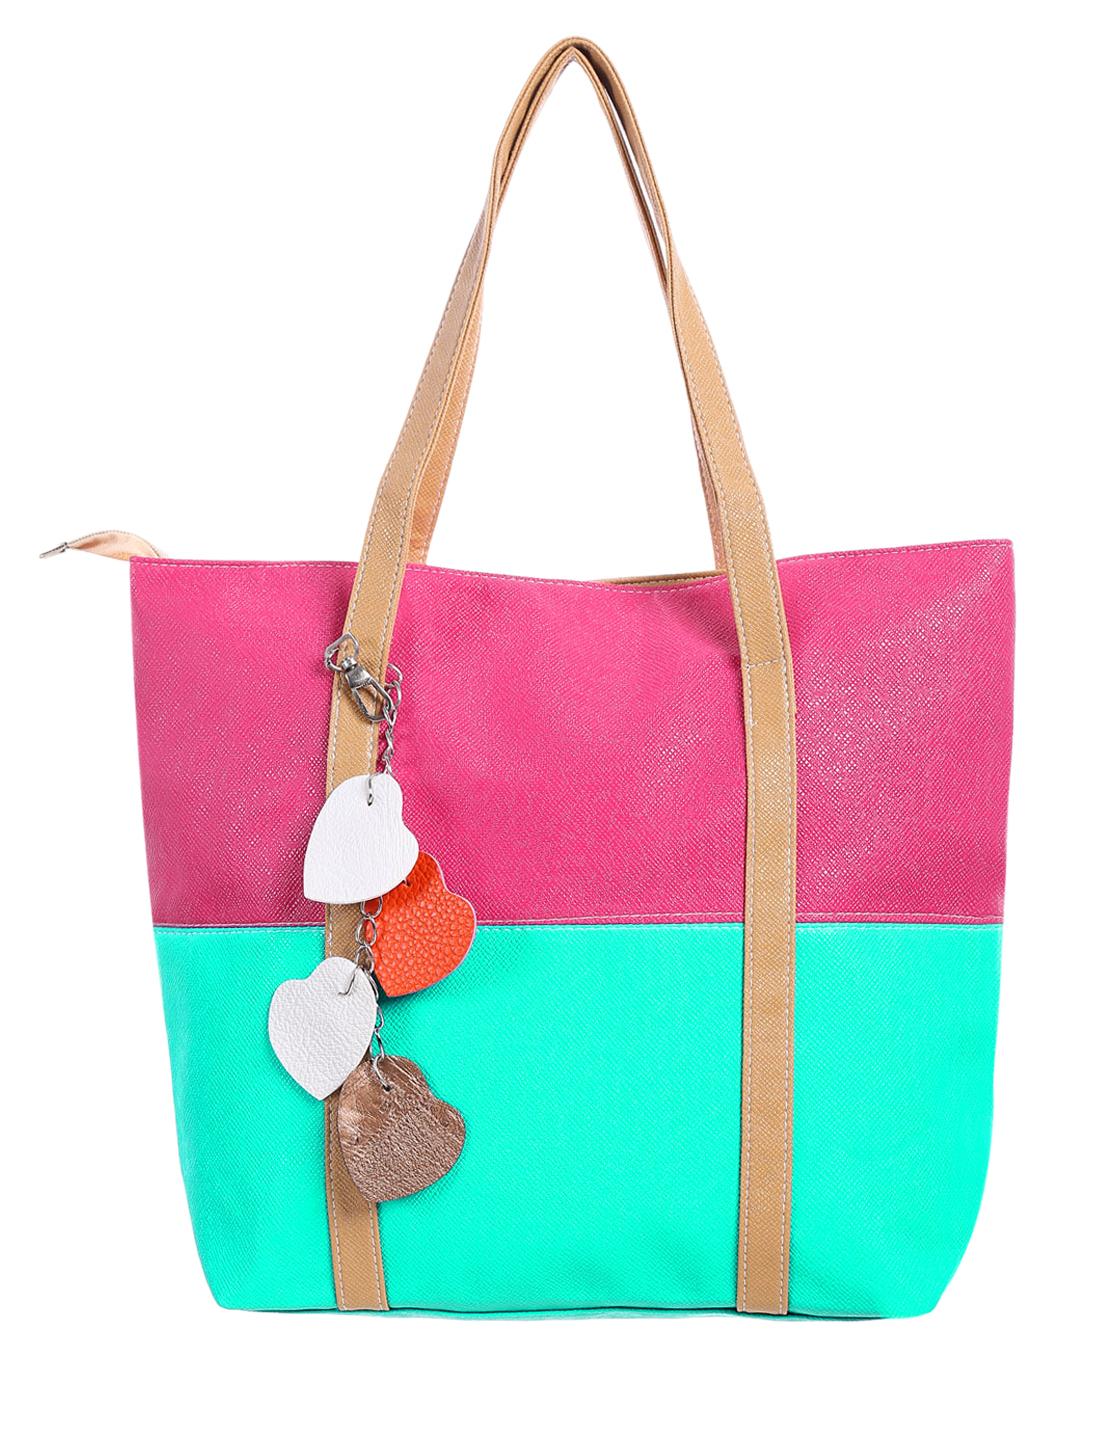 Women Color Block Dual Handles Zippered Top Casual Tote Bags Dark Mint Fuchsia